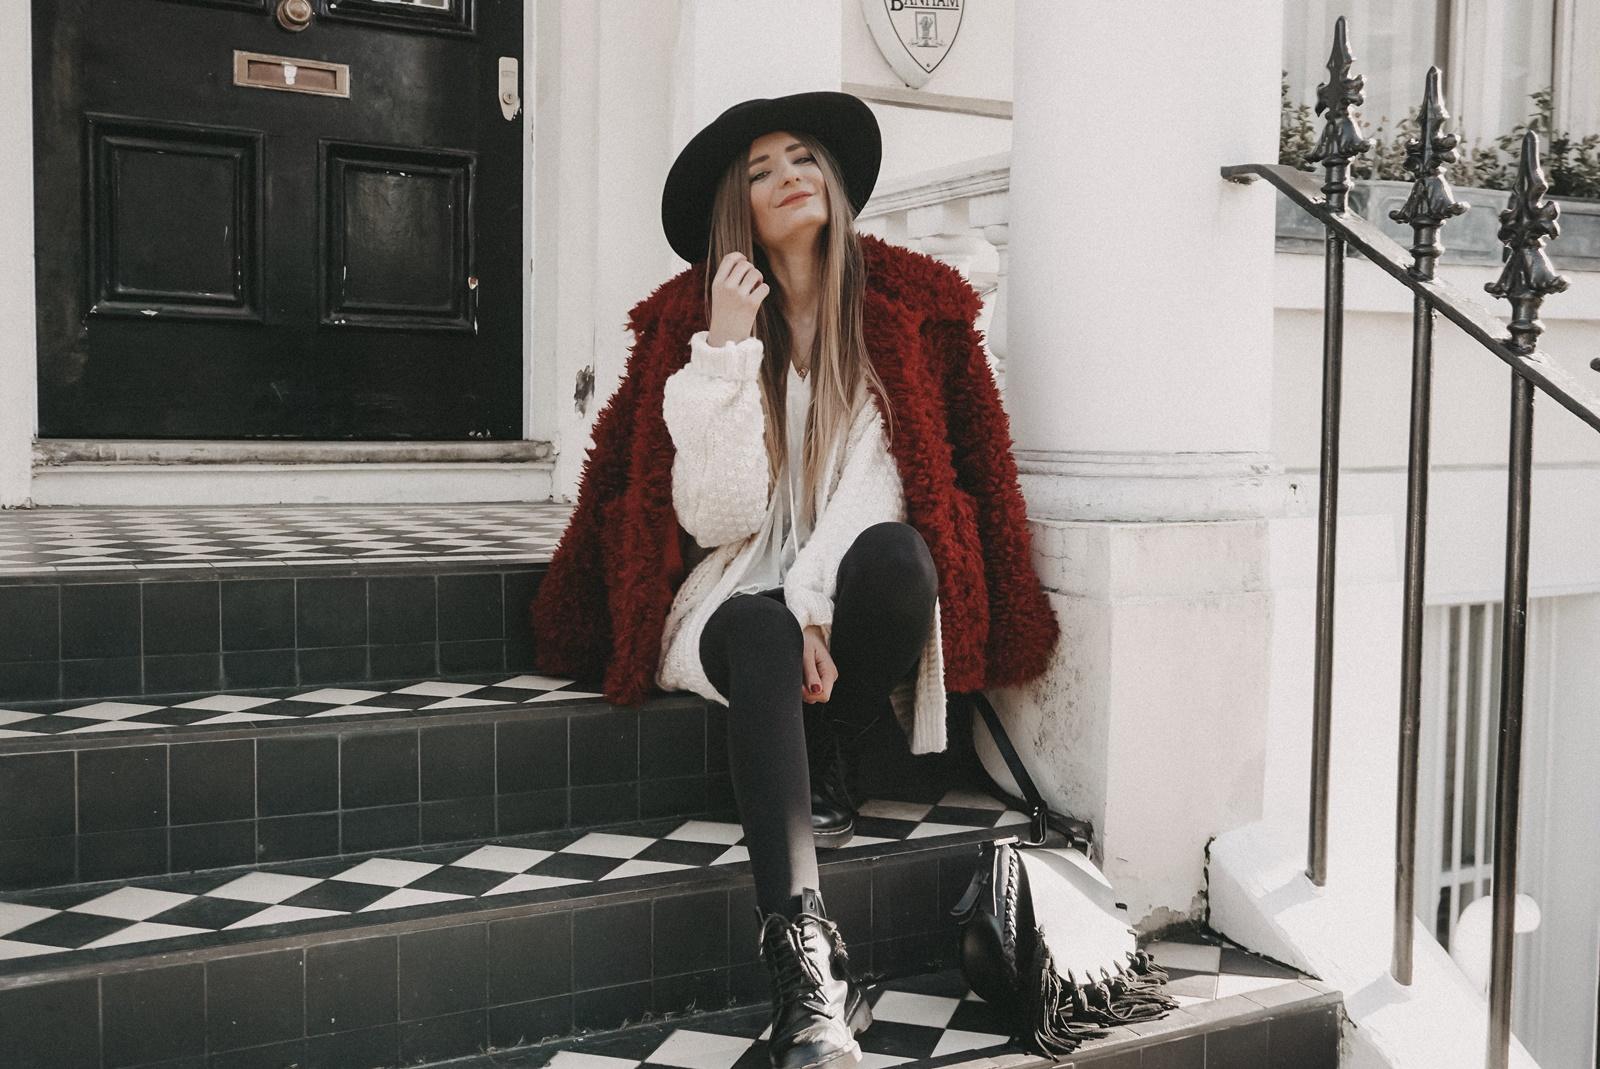 London Travel Guide: Shopping, Cafés & Instagram Spots